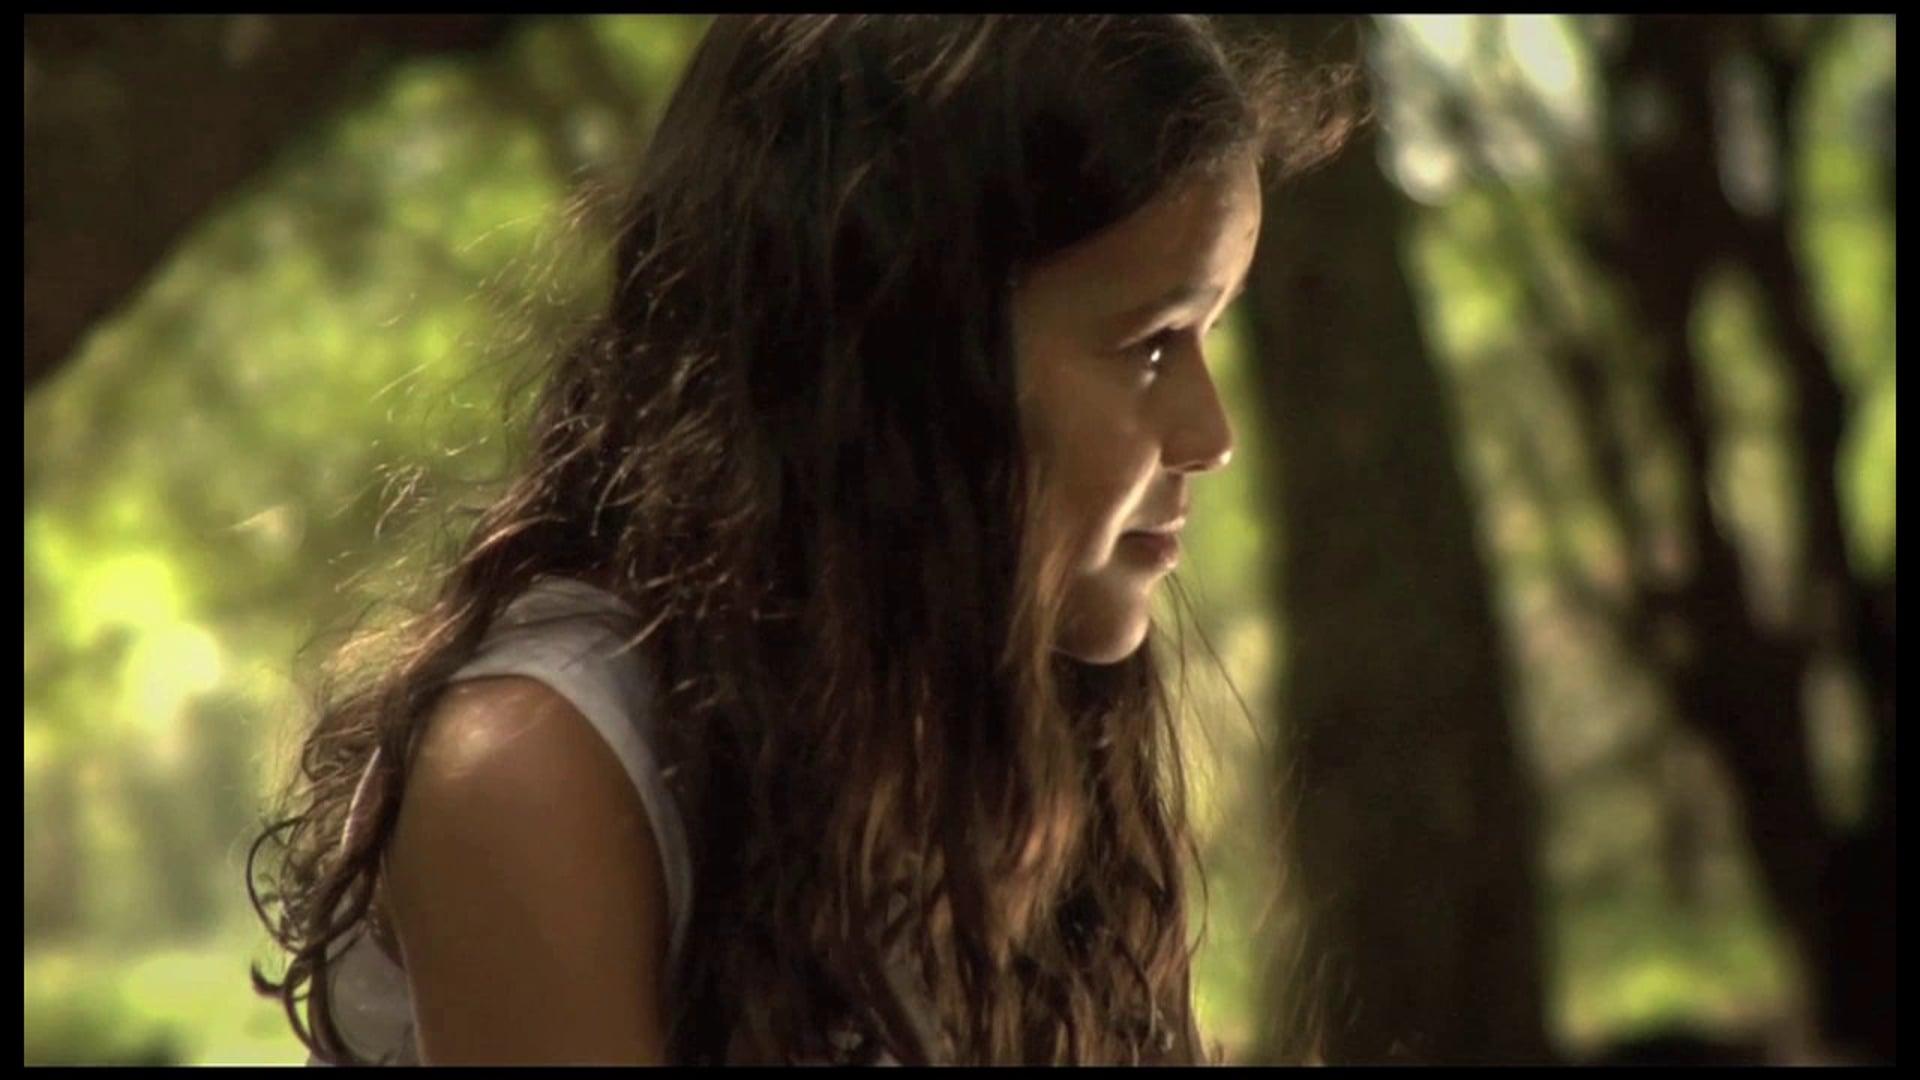 A Menina Espantalho | The Scarecrow Girl - film excerpt